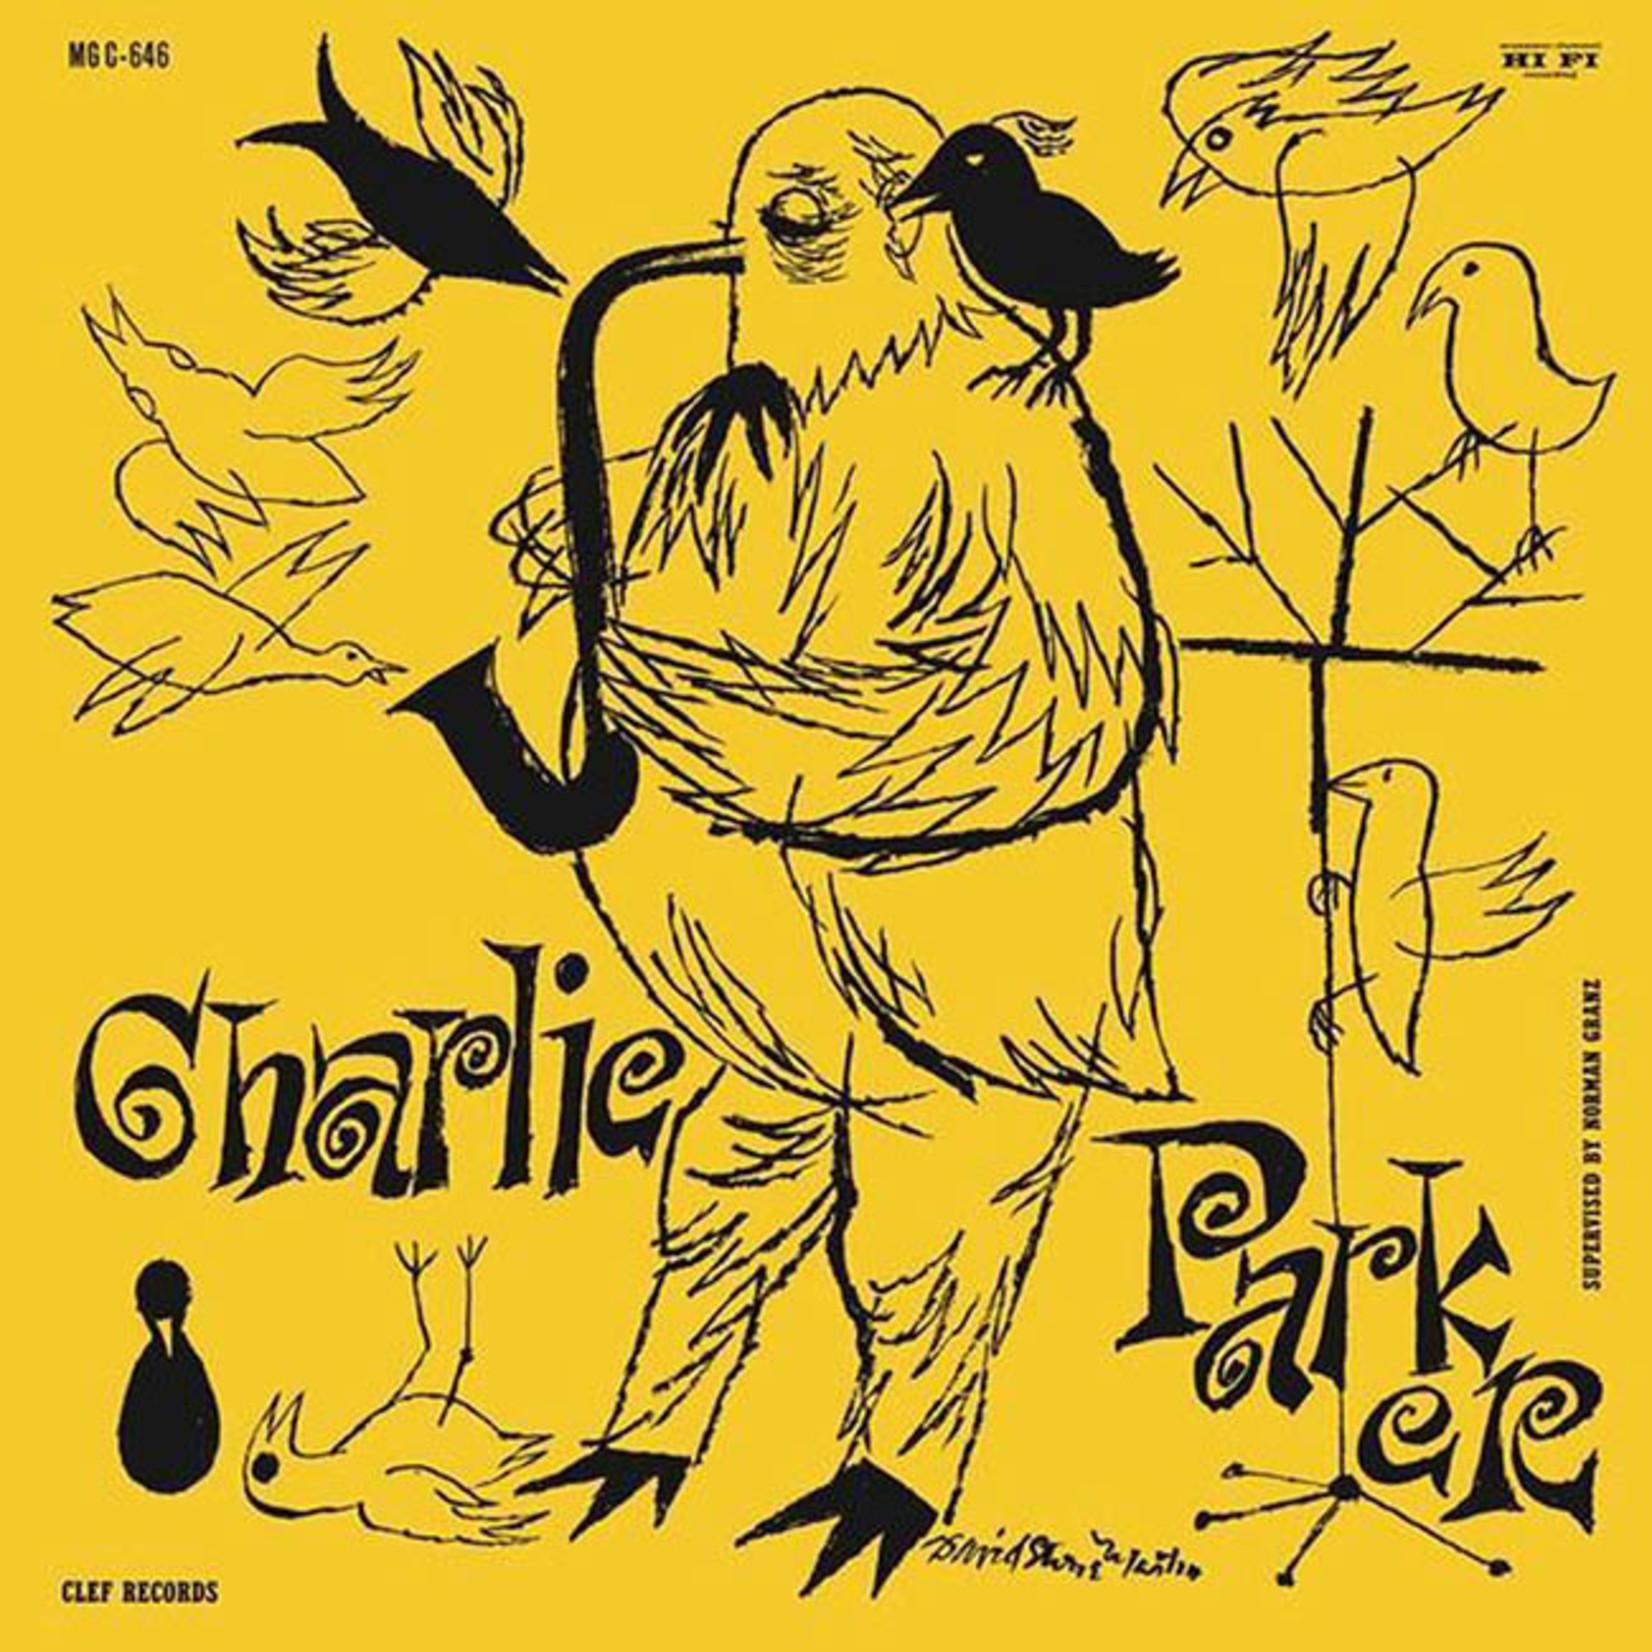 [New] Parker, Charlie: The Magnificent Charlie Parker (mono mix)